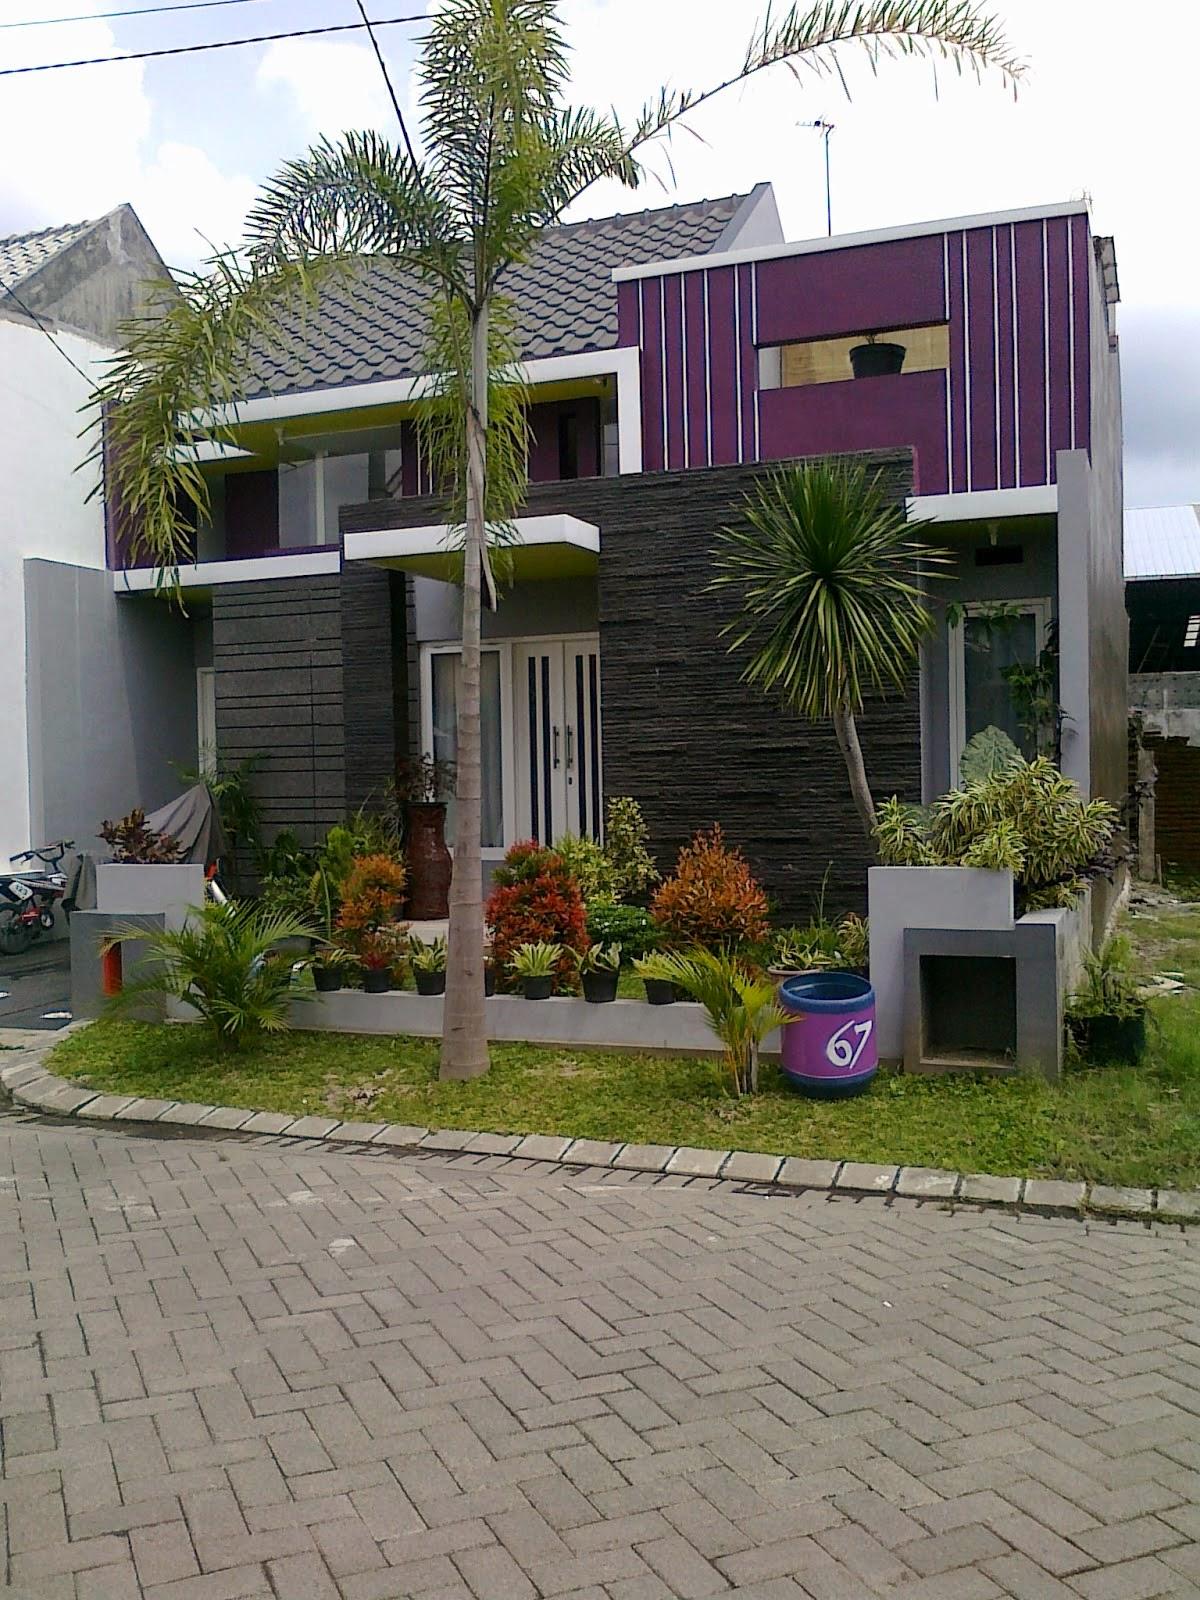 Top Contoh Pagar Rumah Minimalis Cluster Gubukhome